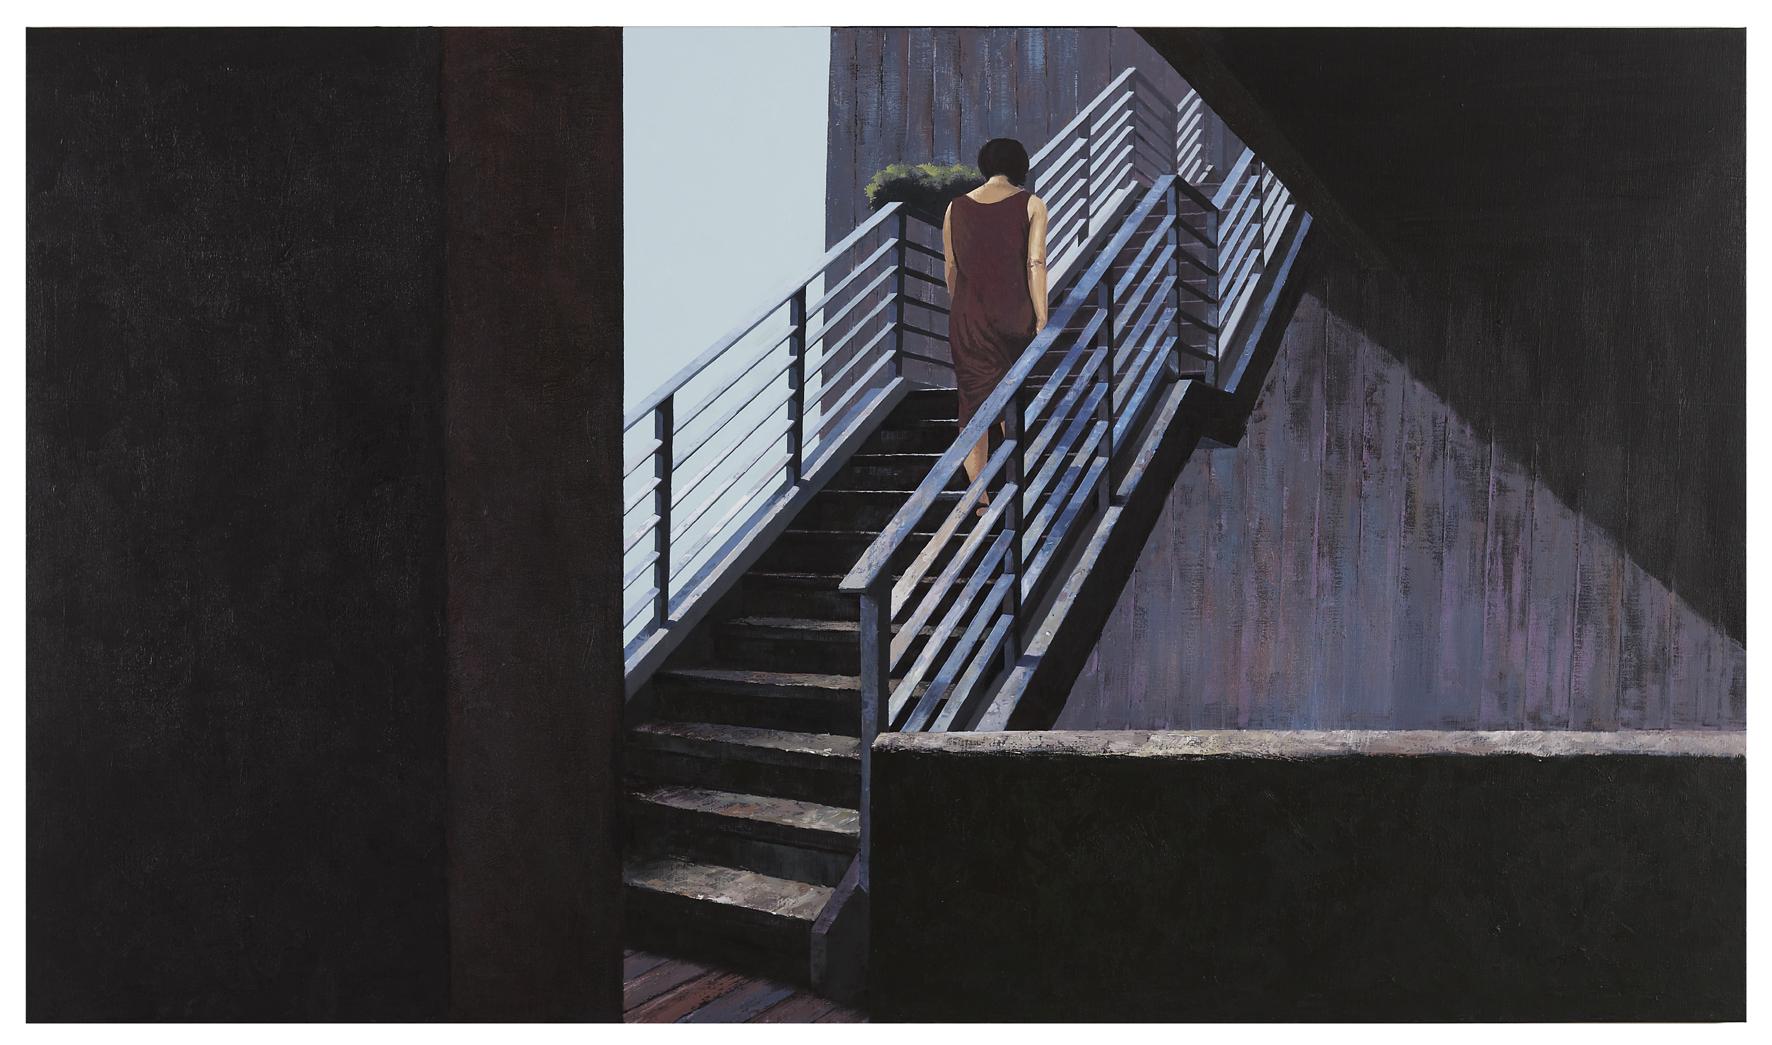 The wall Ⅱ. Dong Yeoun Kim